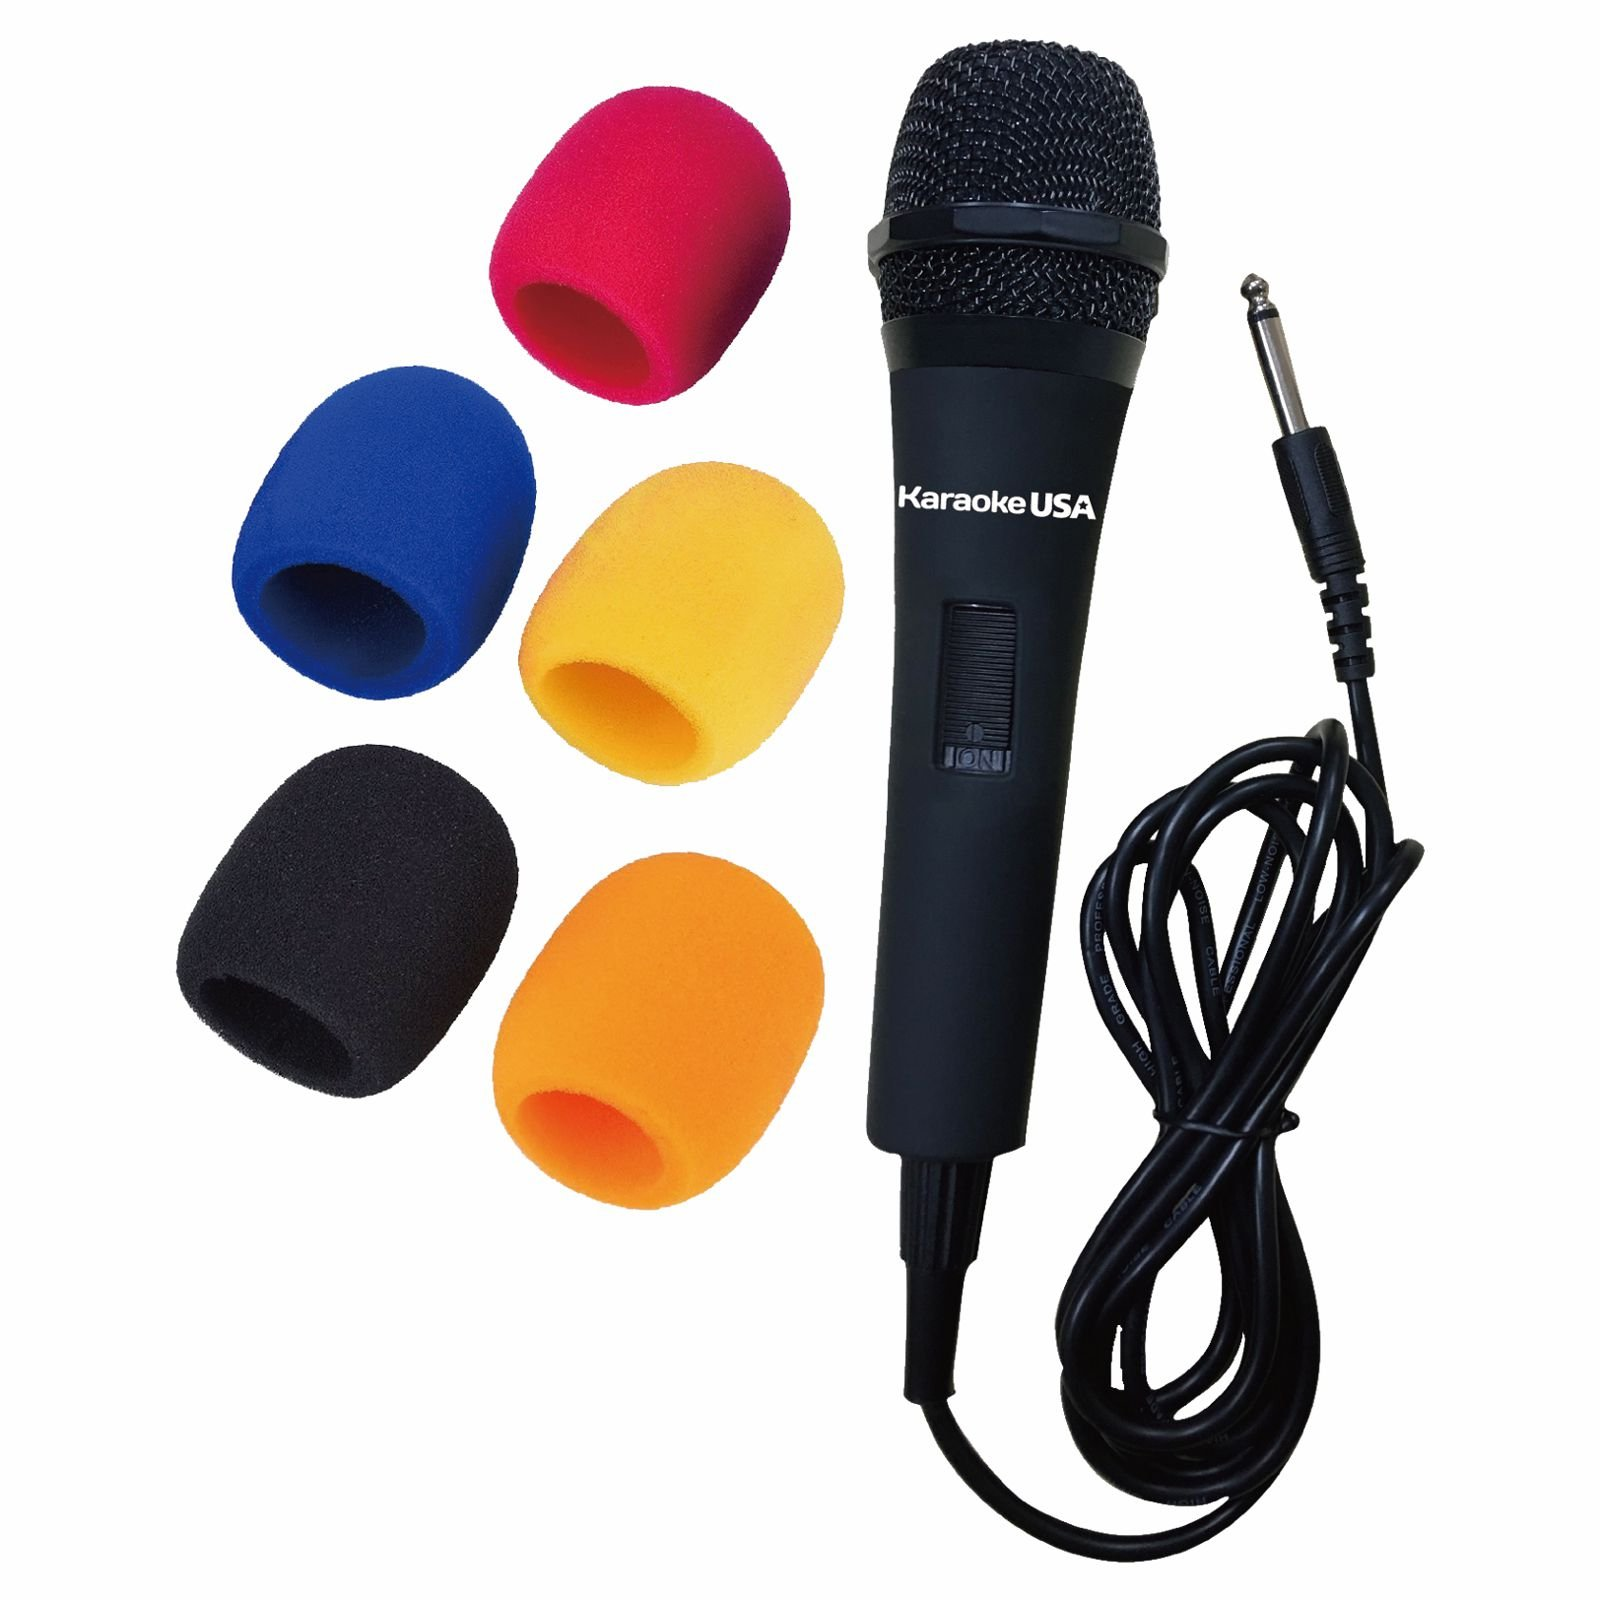 Karaoke USA M175 Professional Microphone